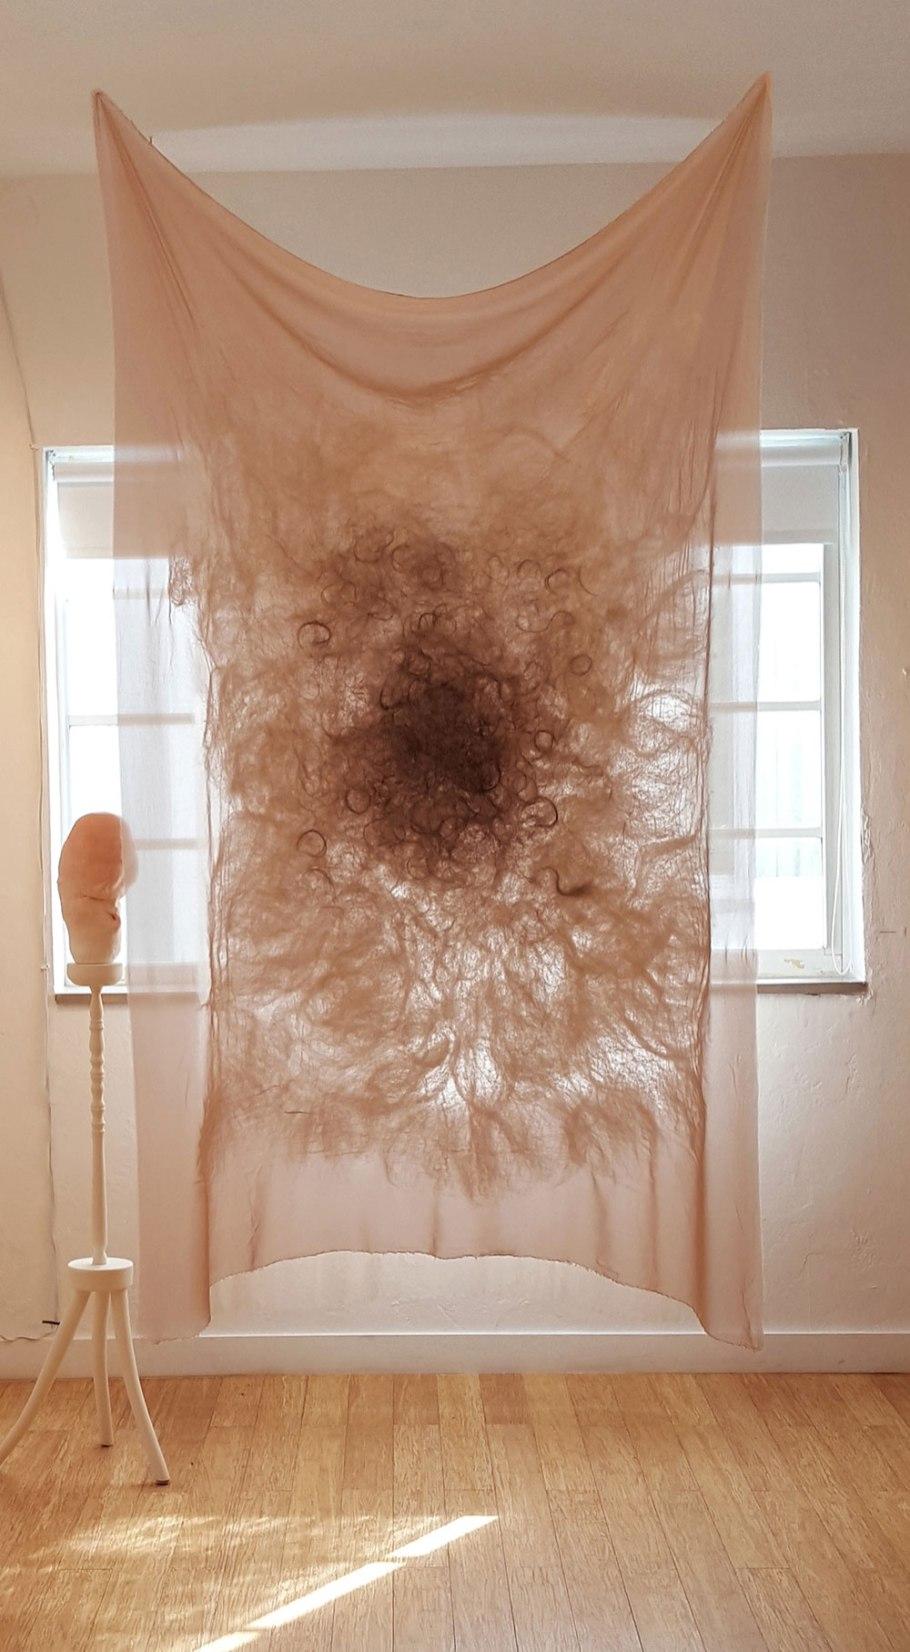 Michelle Laxalt, Installation shot of derma (fester) and Swell at Aqua Art Miami, 2016